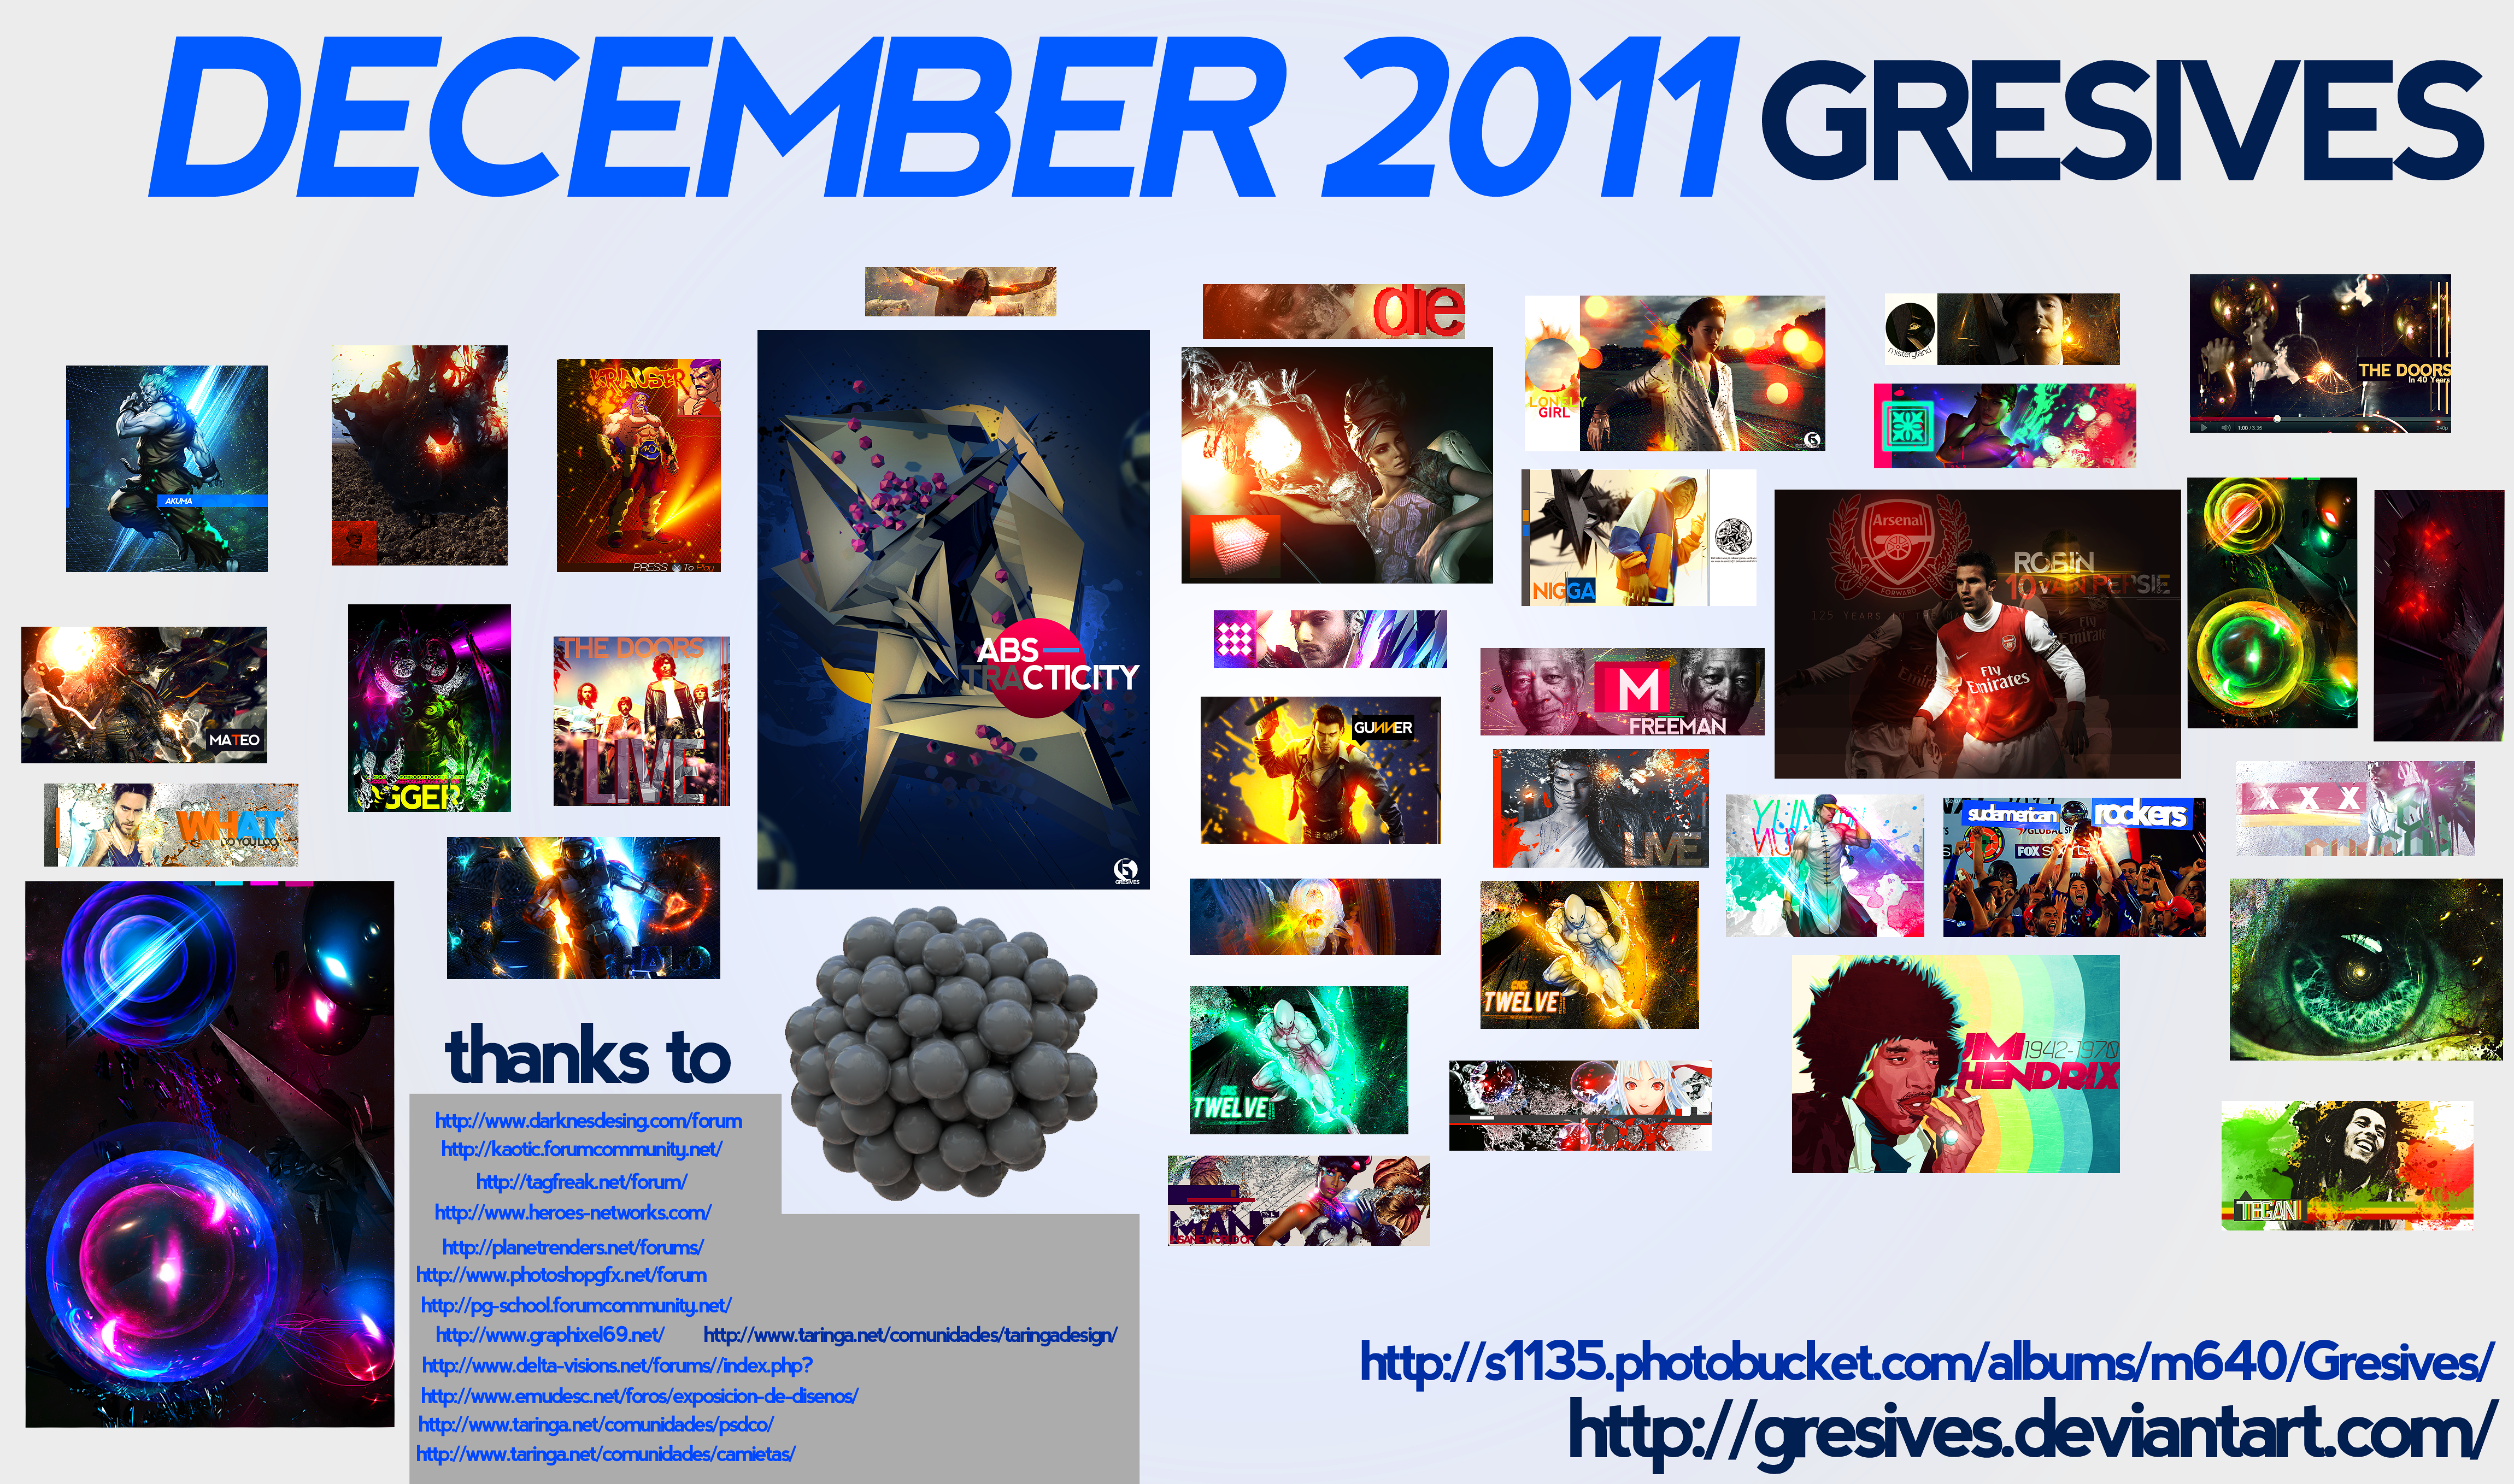 Diciembre2011 by Gresives